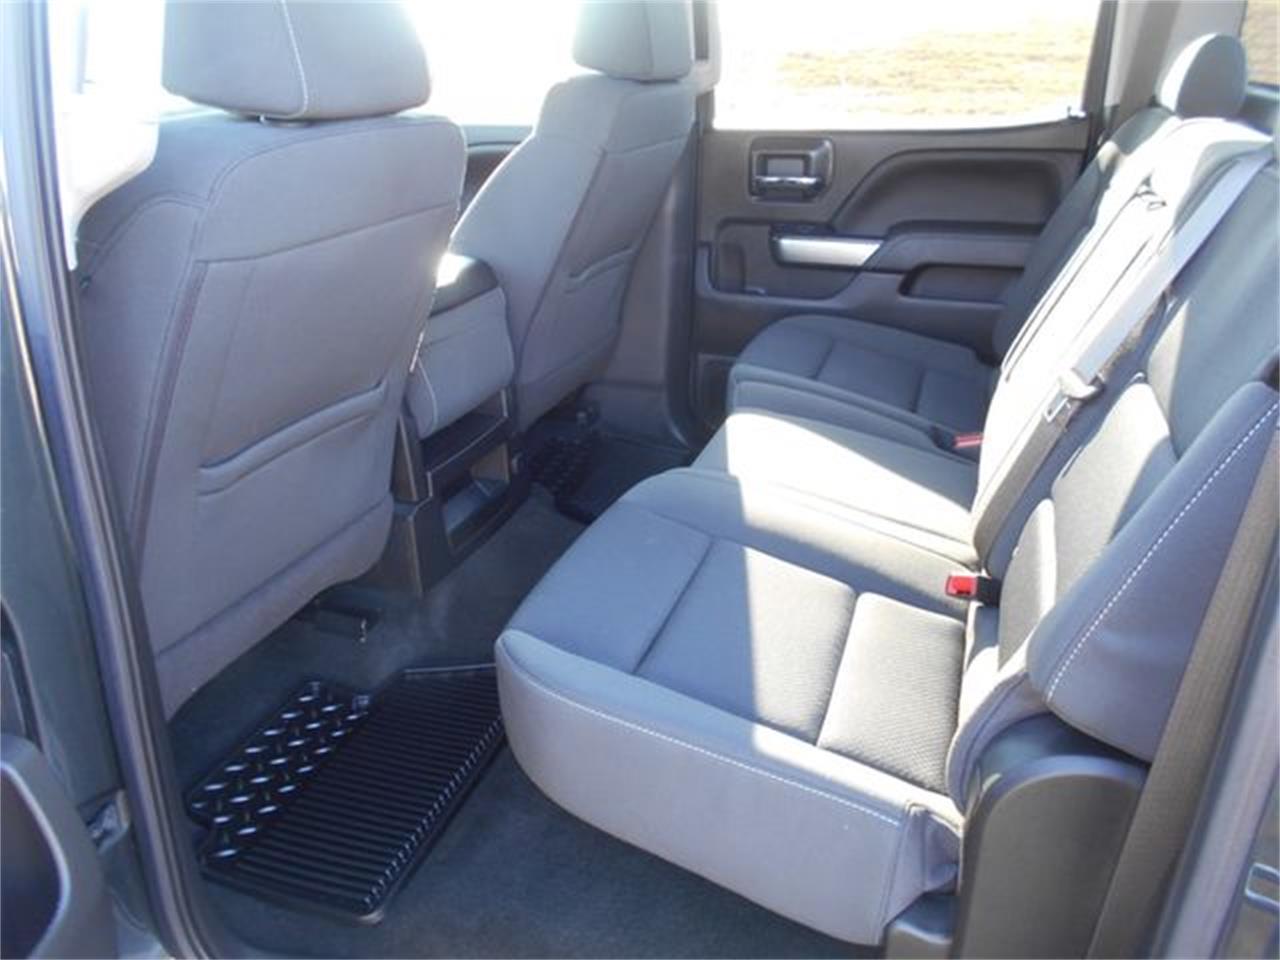 2017 Chevrolet Silverado (CC-1111358) for sale in Blanchard, Oklahoma